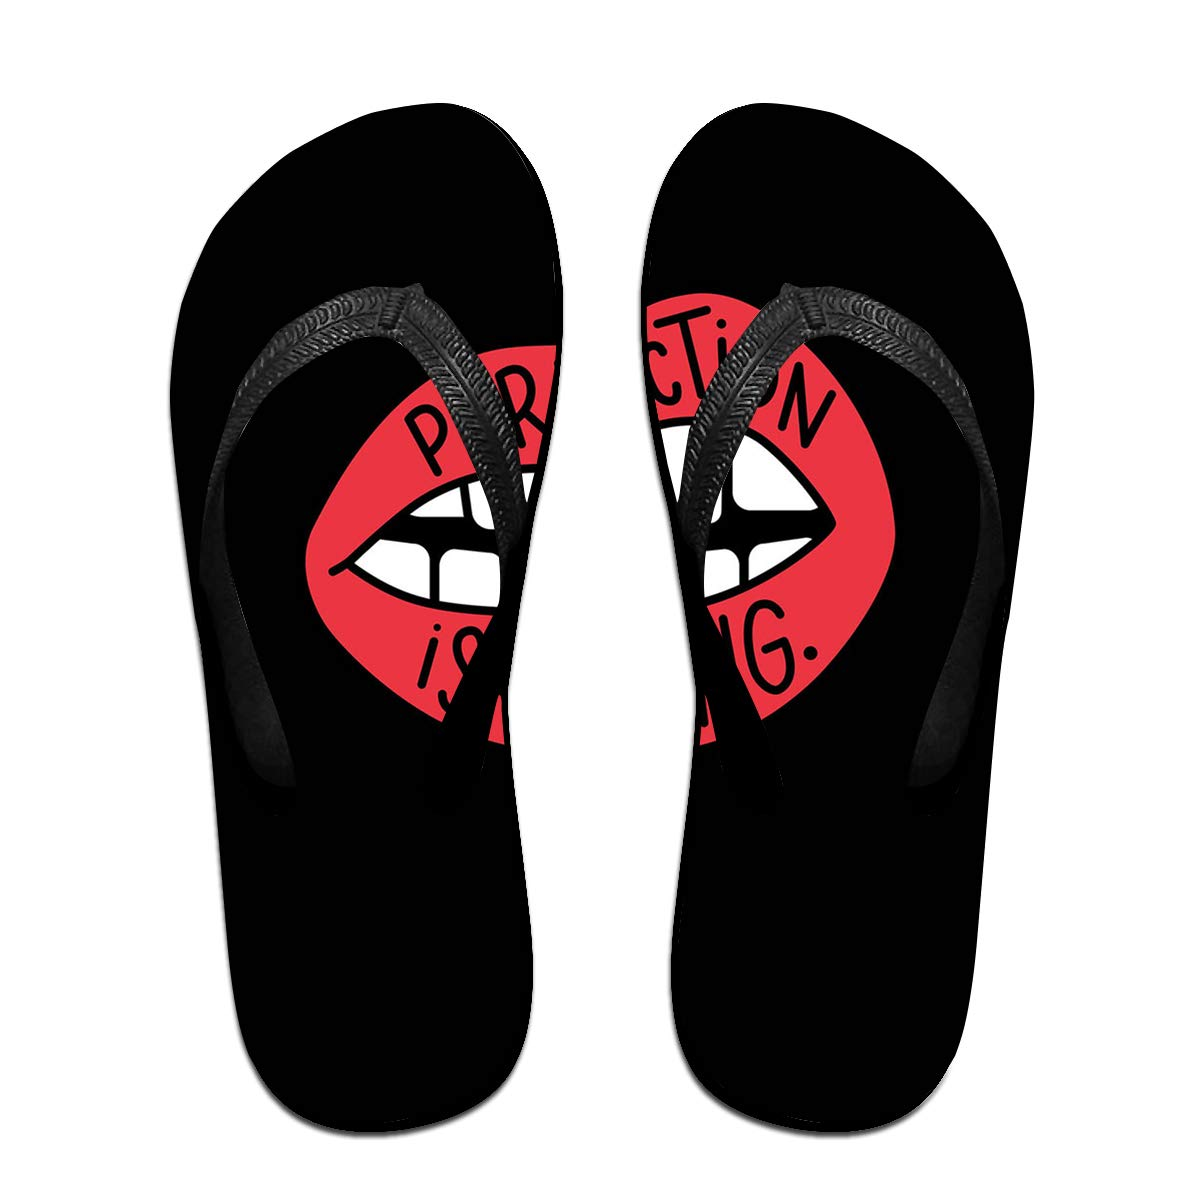 Lojaon Couple Slipper Perfection is Boring Print Flip Flops Unisex Chic Sandals Rubber Non-Slip Beach Thong Slippers